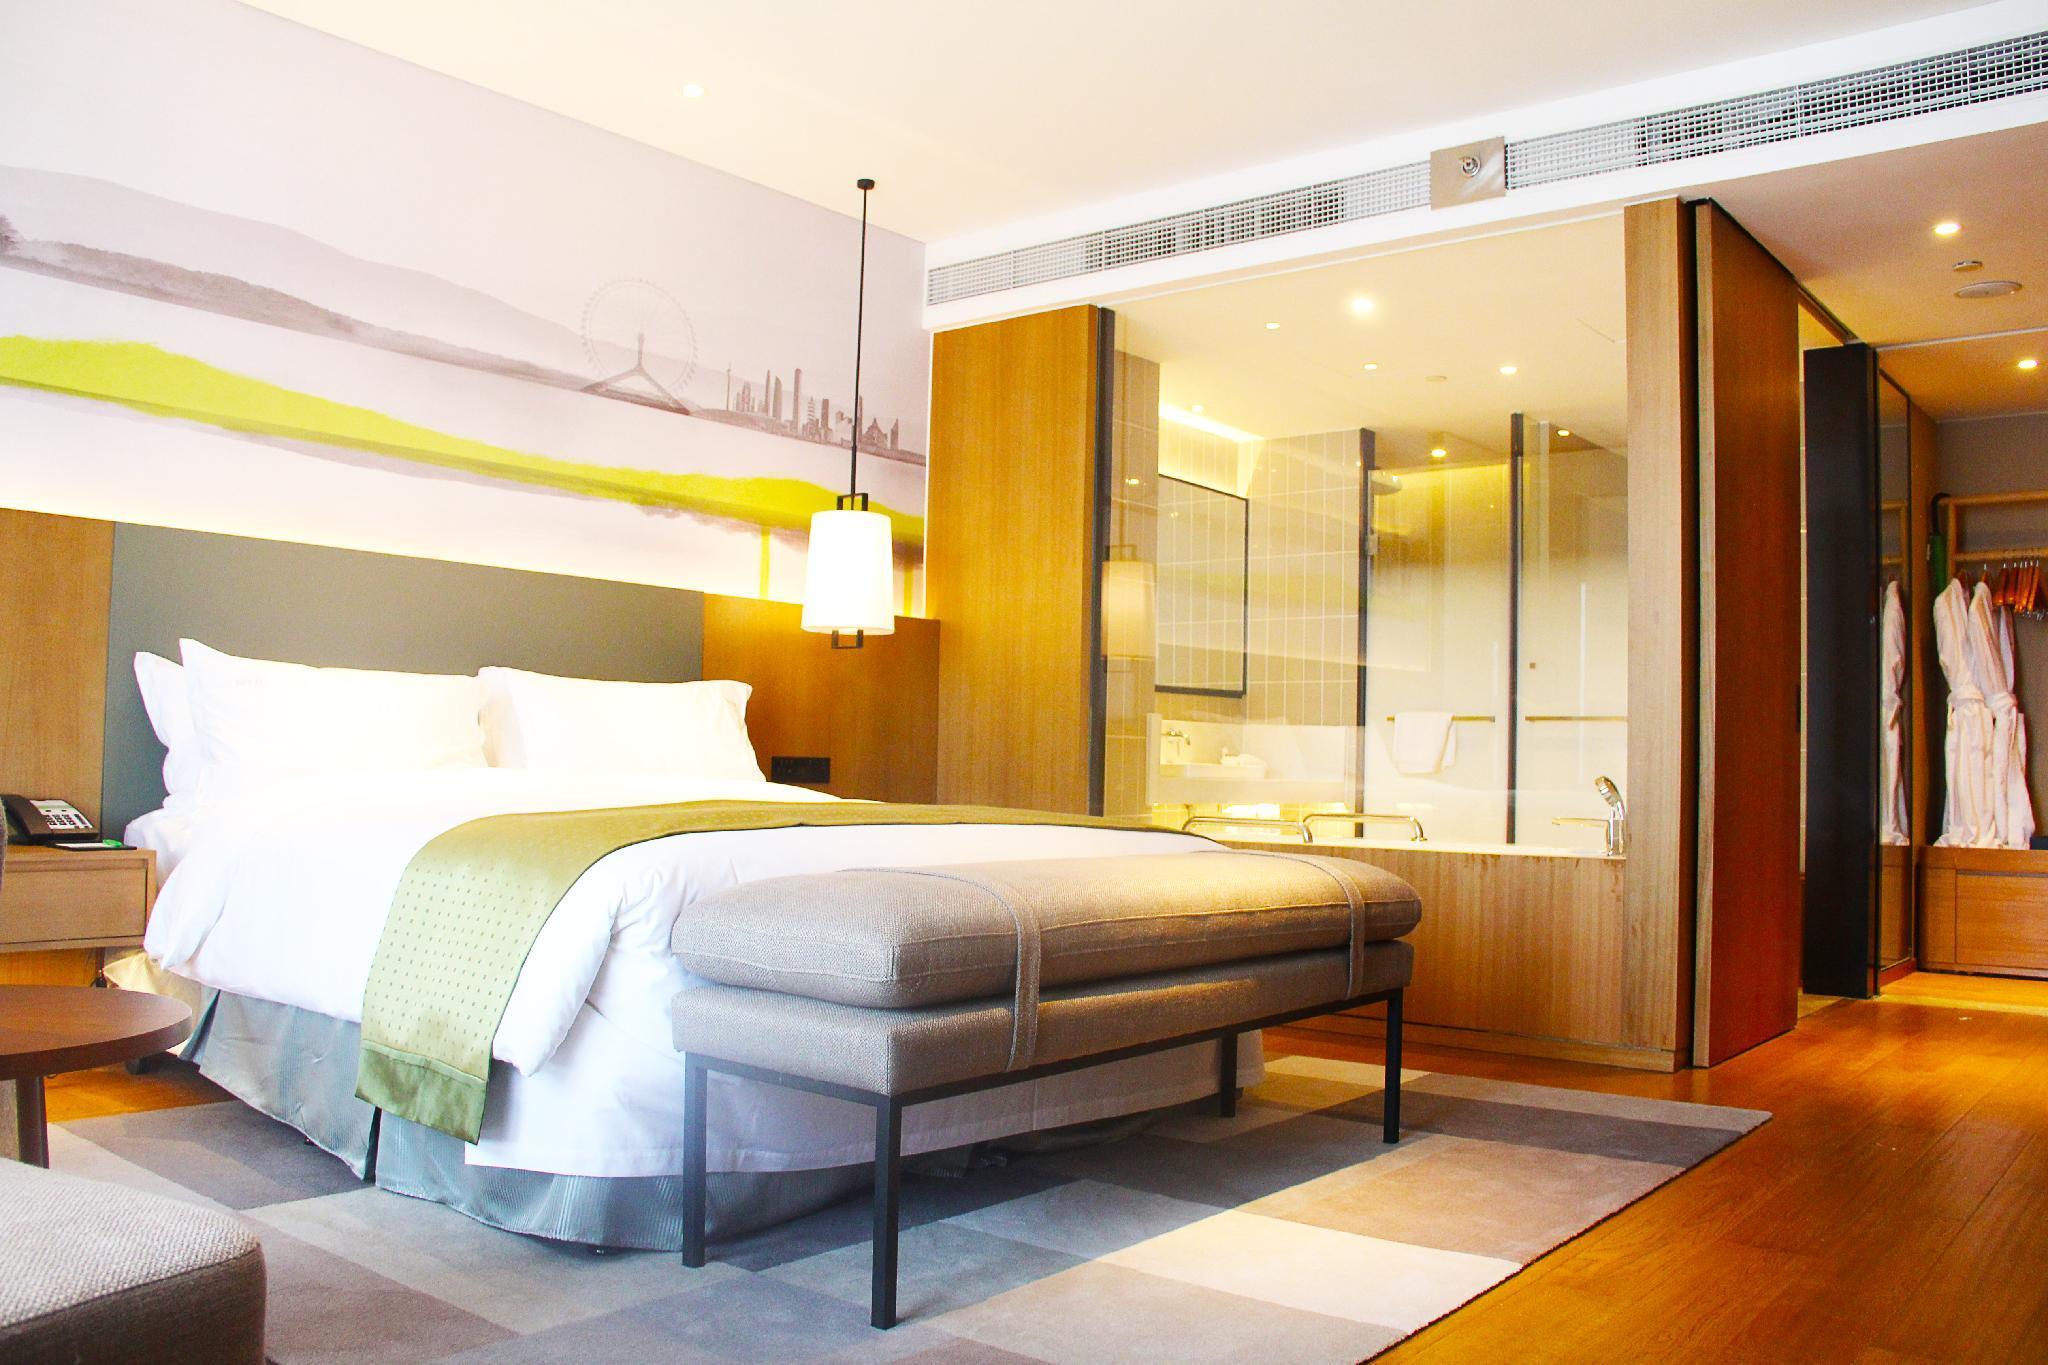 Holiday Inn Hotel & Suites Tianjin Downtown, Tianjin